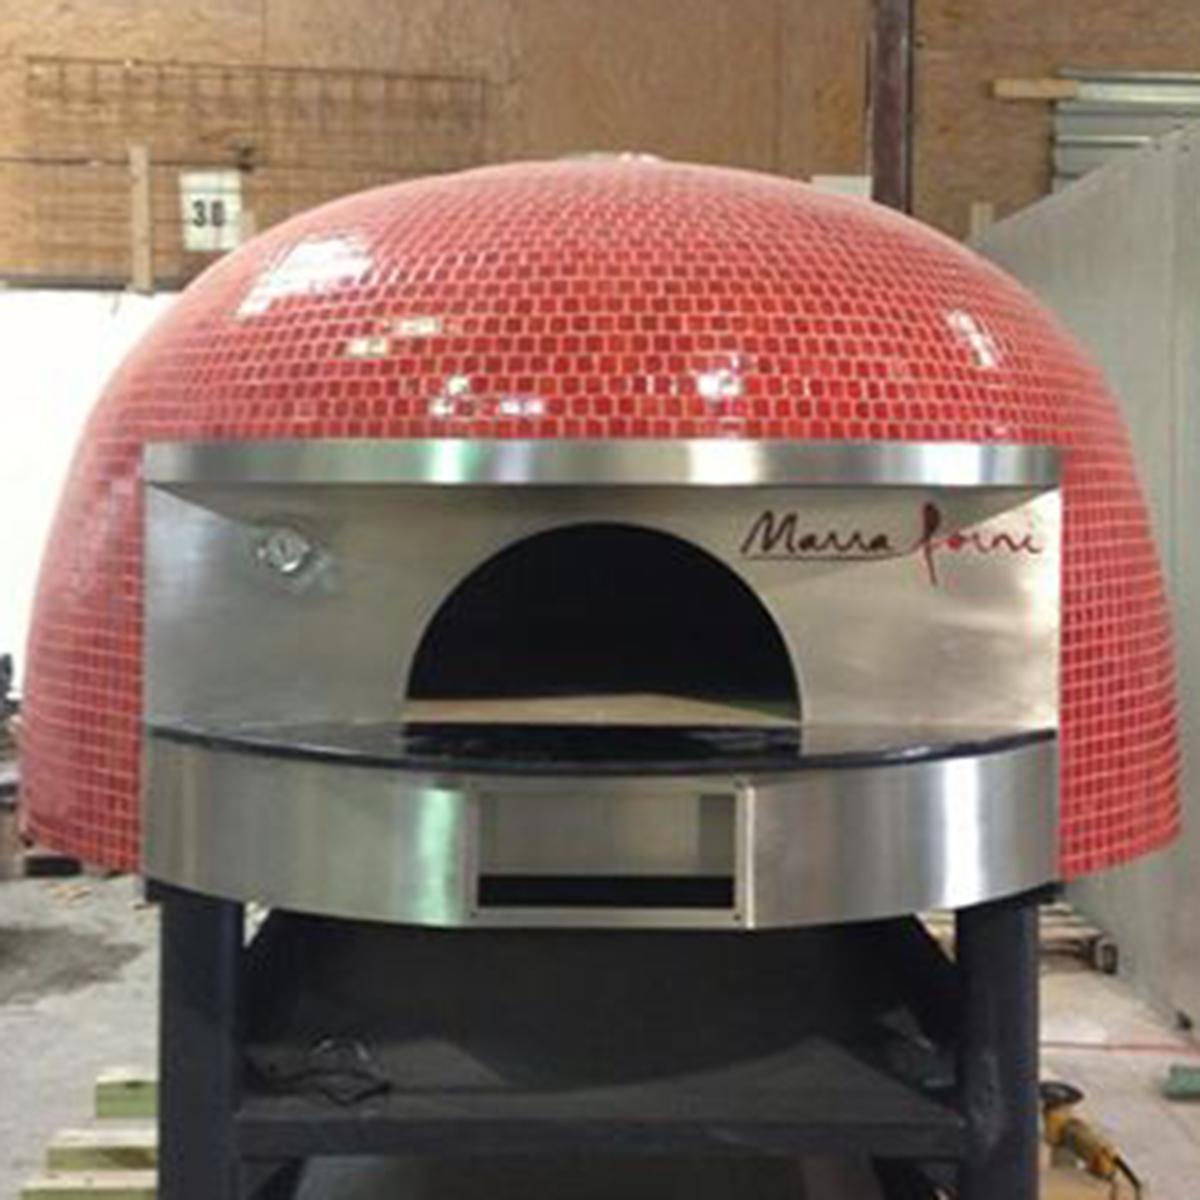 pastoral pizza oven